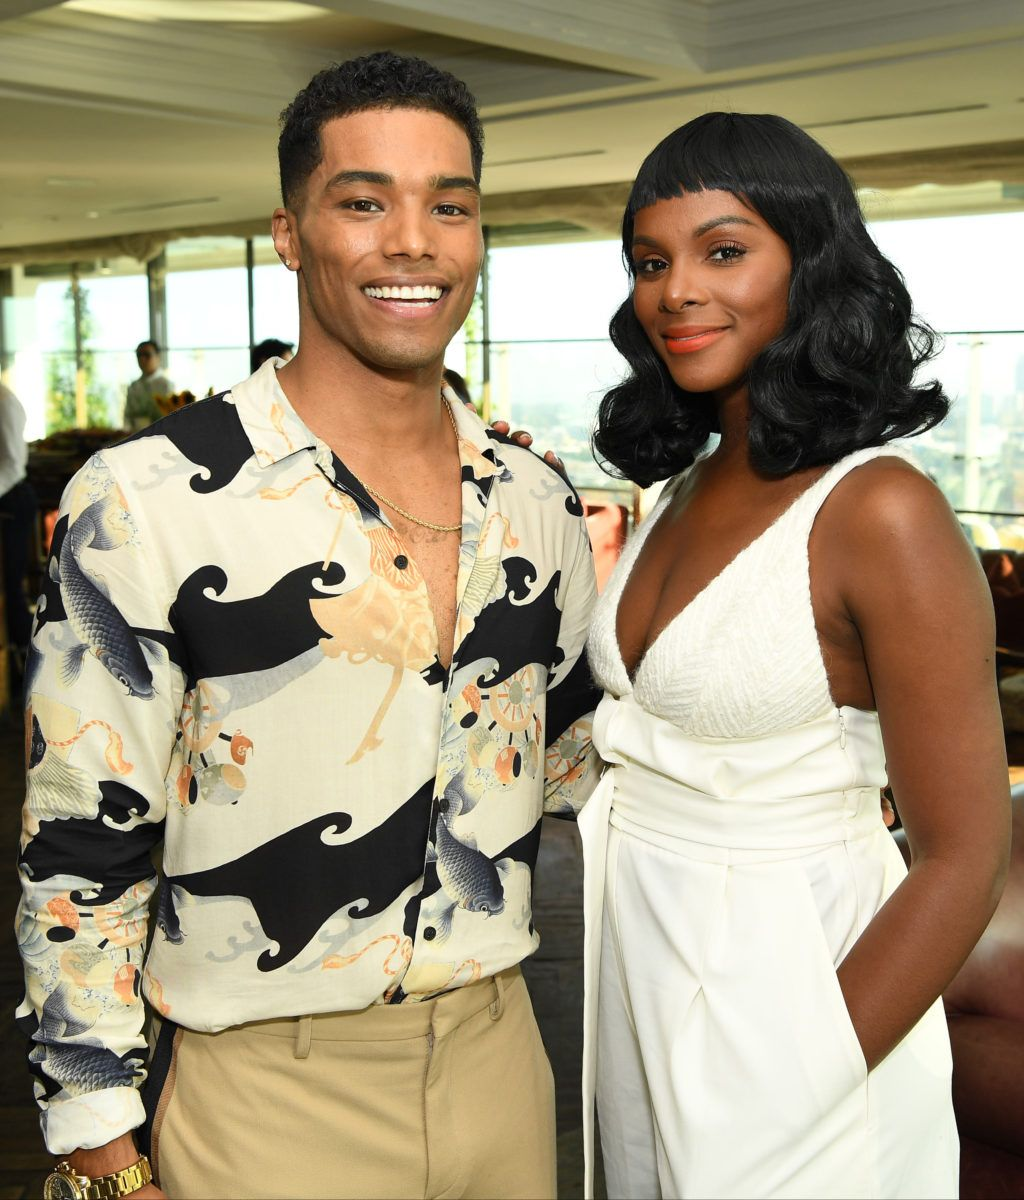 dating black girl londra emilia și brent masterchef dating